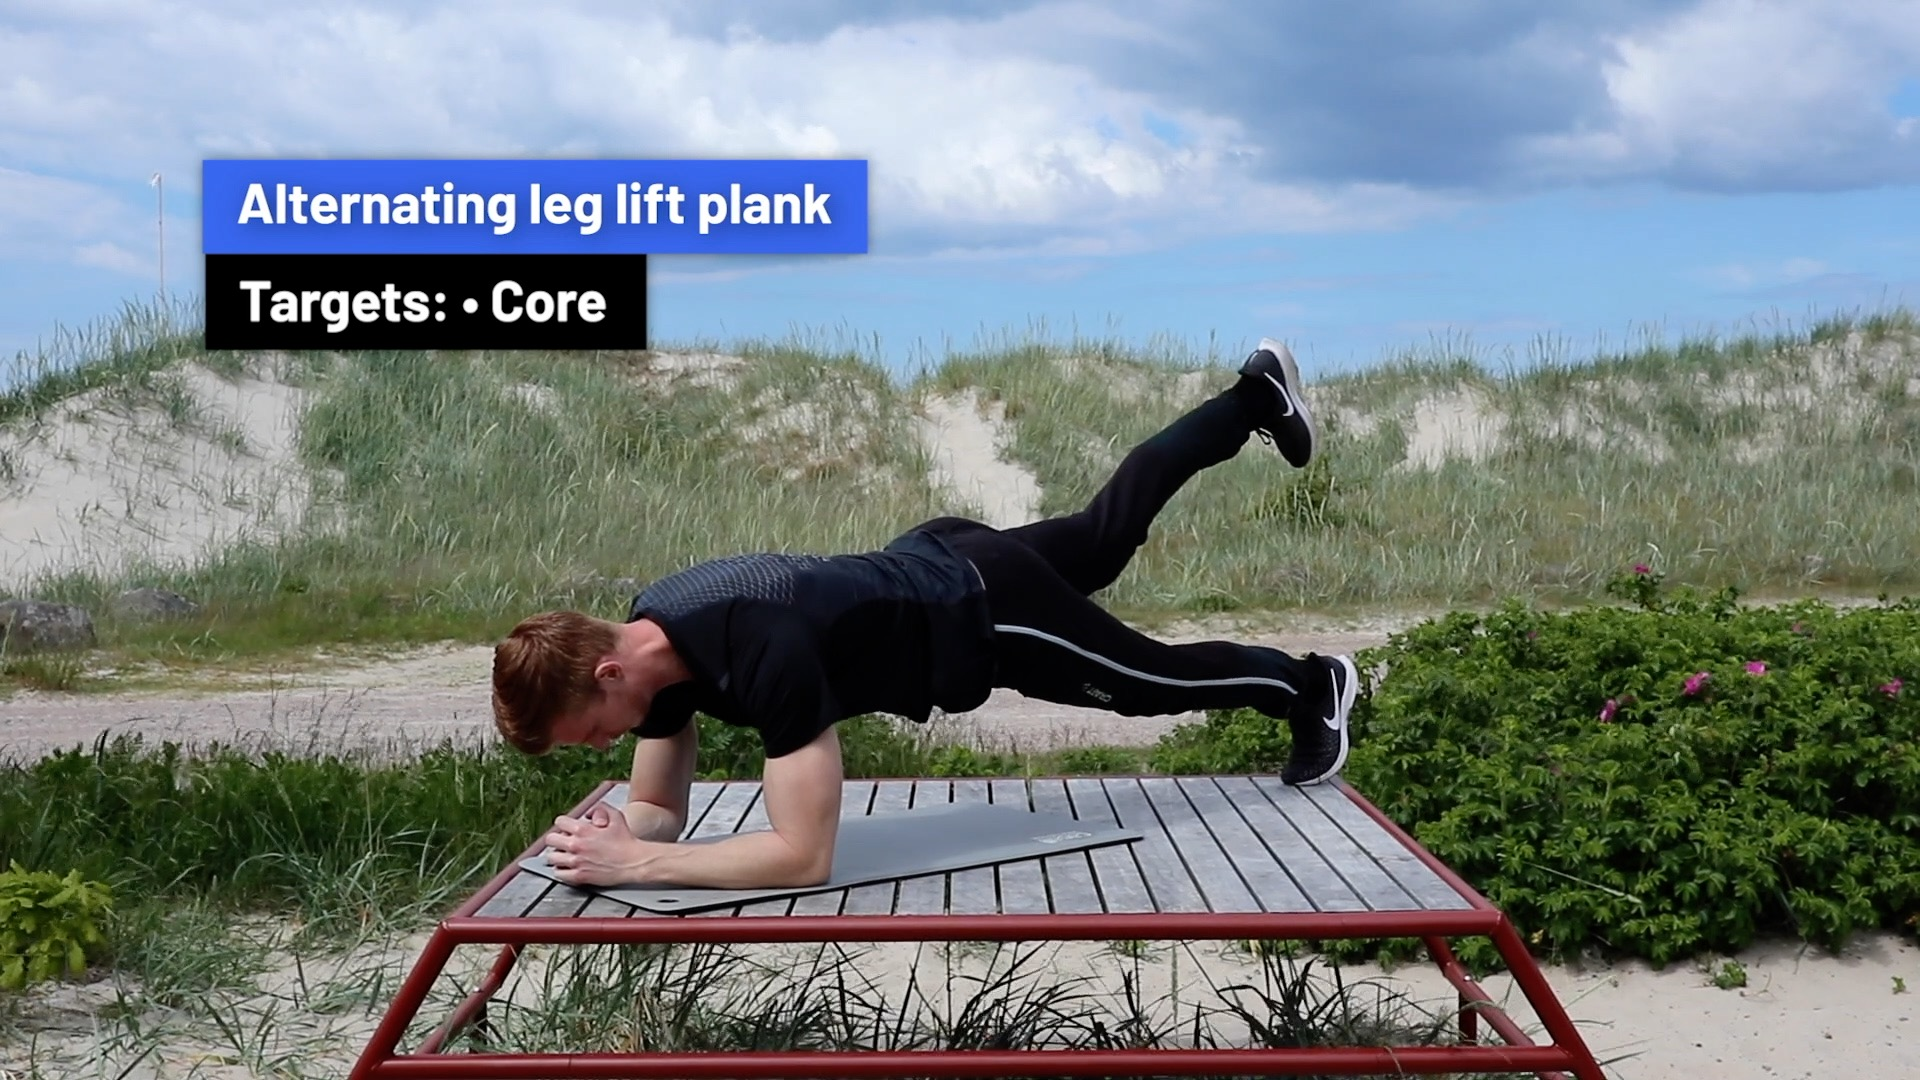 Alternating leg lift plank